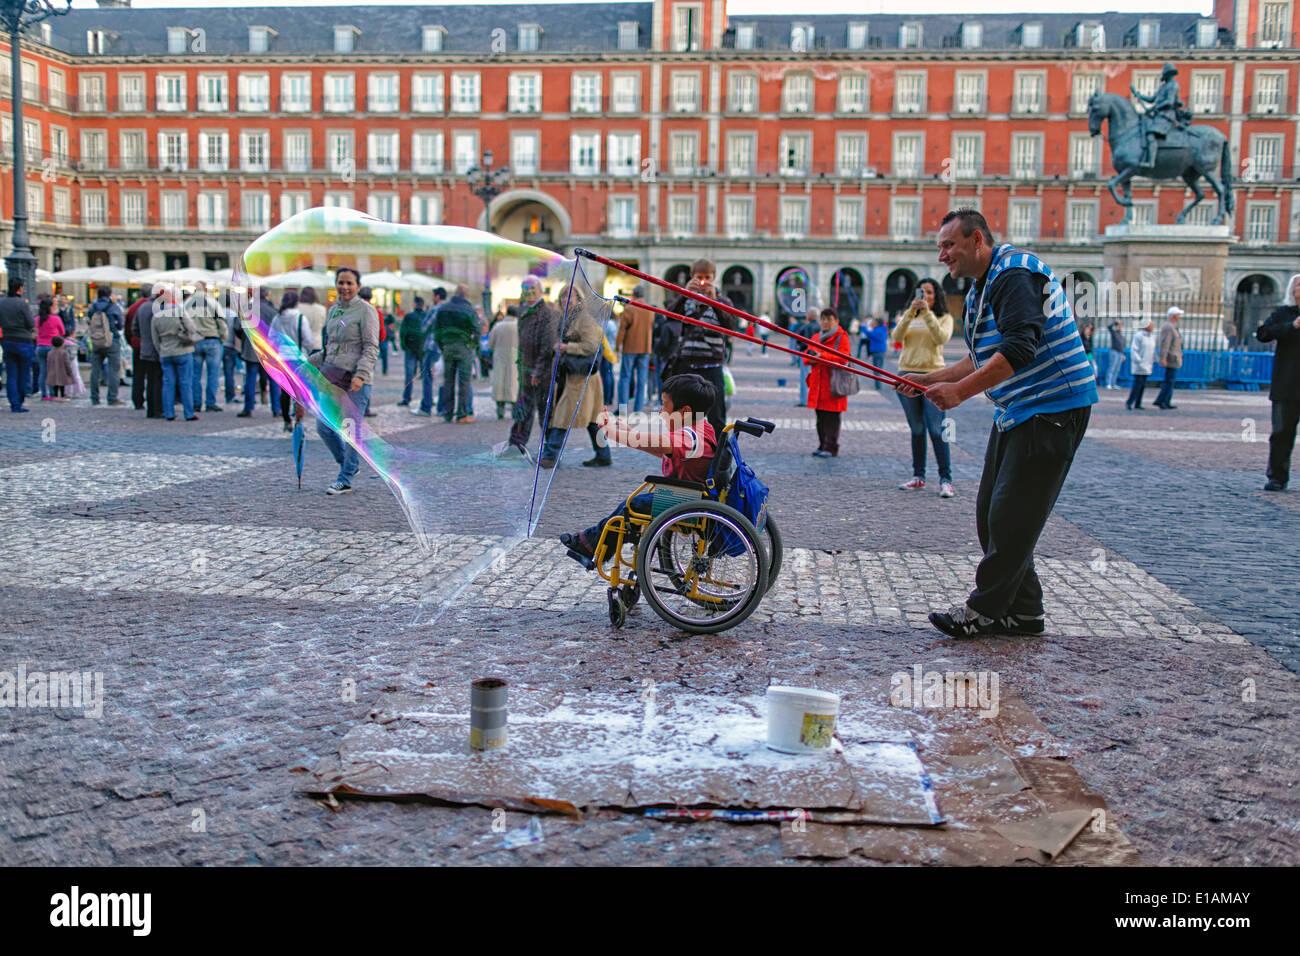 Soap Bubble artista envuelve a niños discapacitados en silla de ruedas con burbuja de jabón, Plaza Mayor, Madrid, España Imagen De Stock